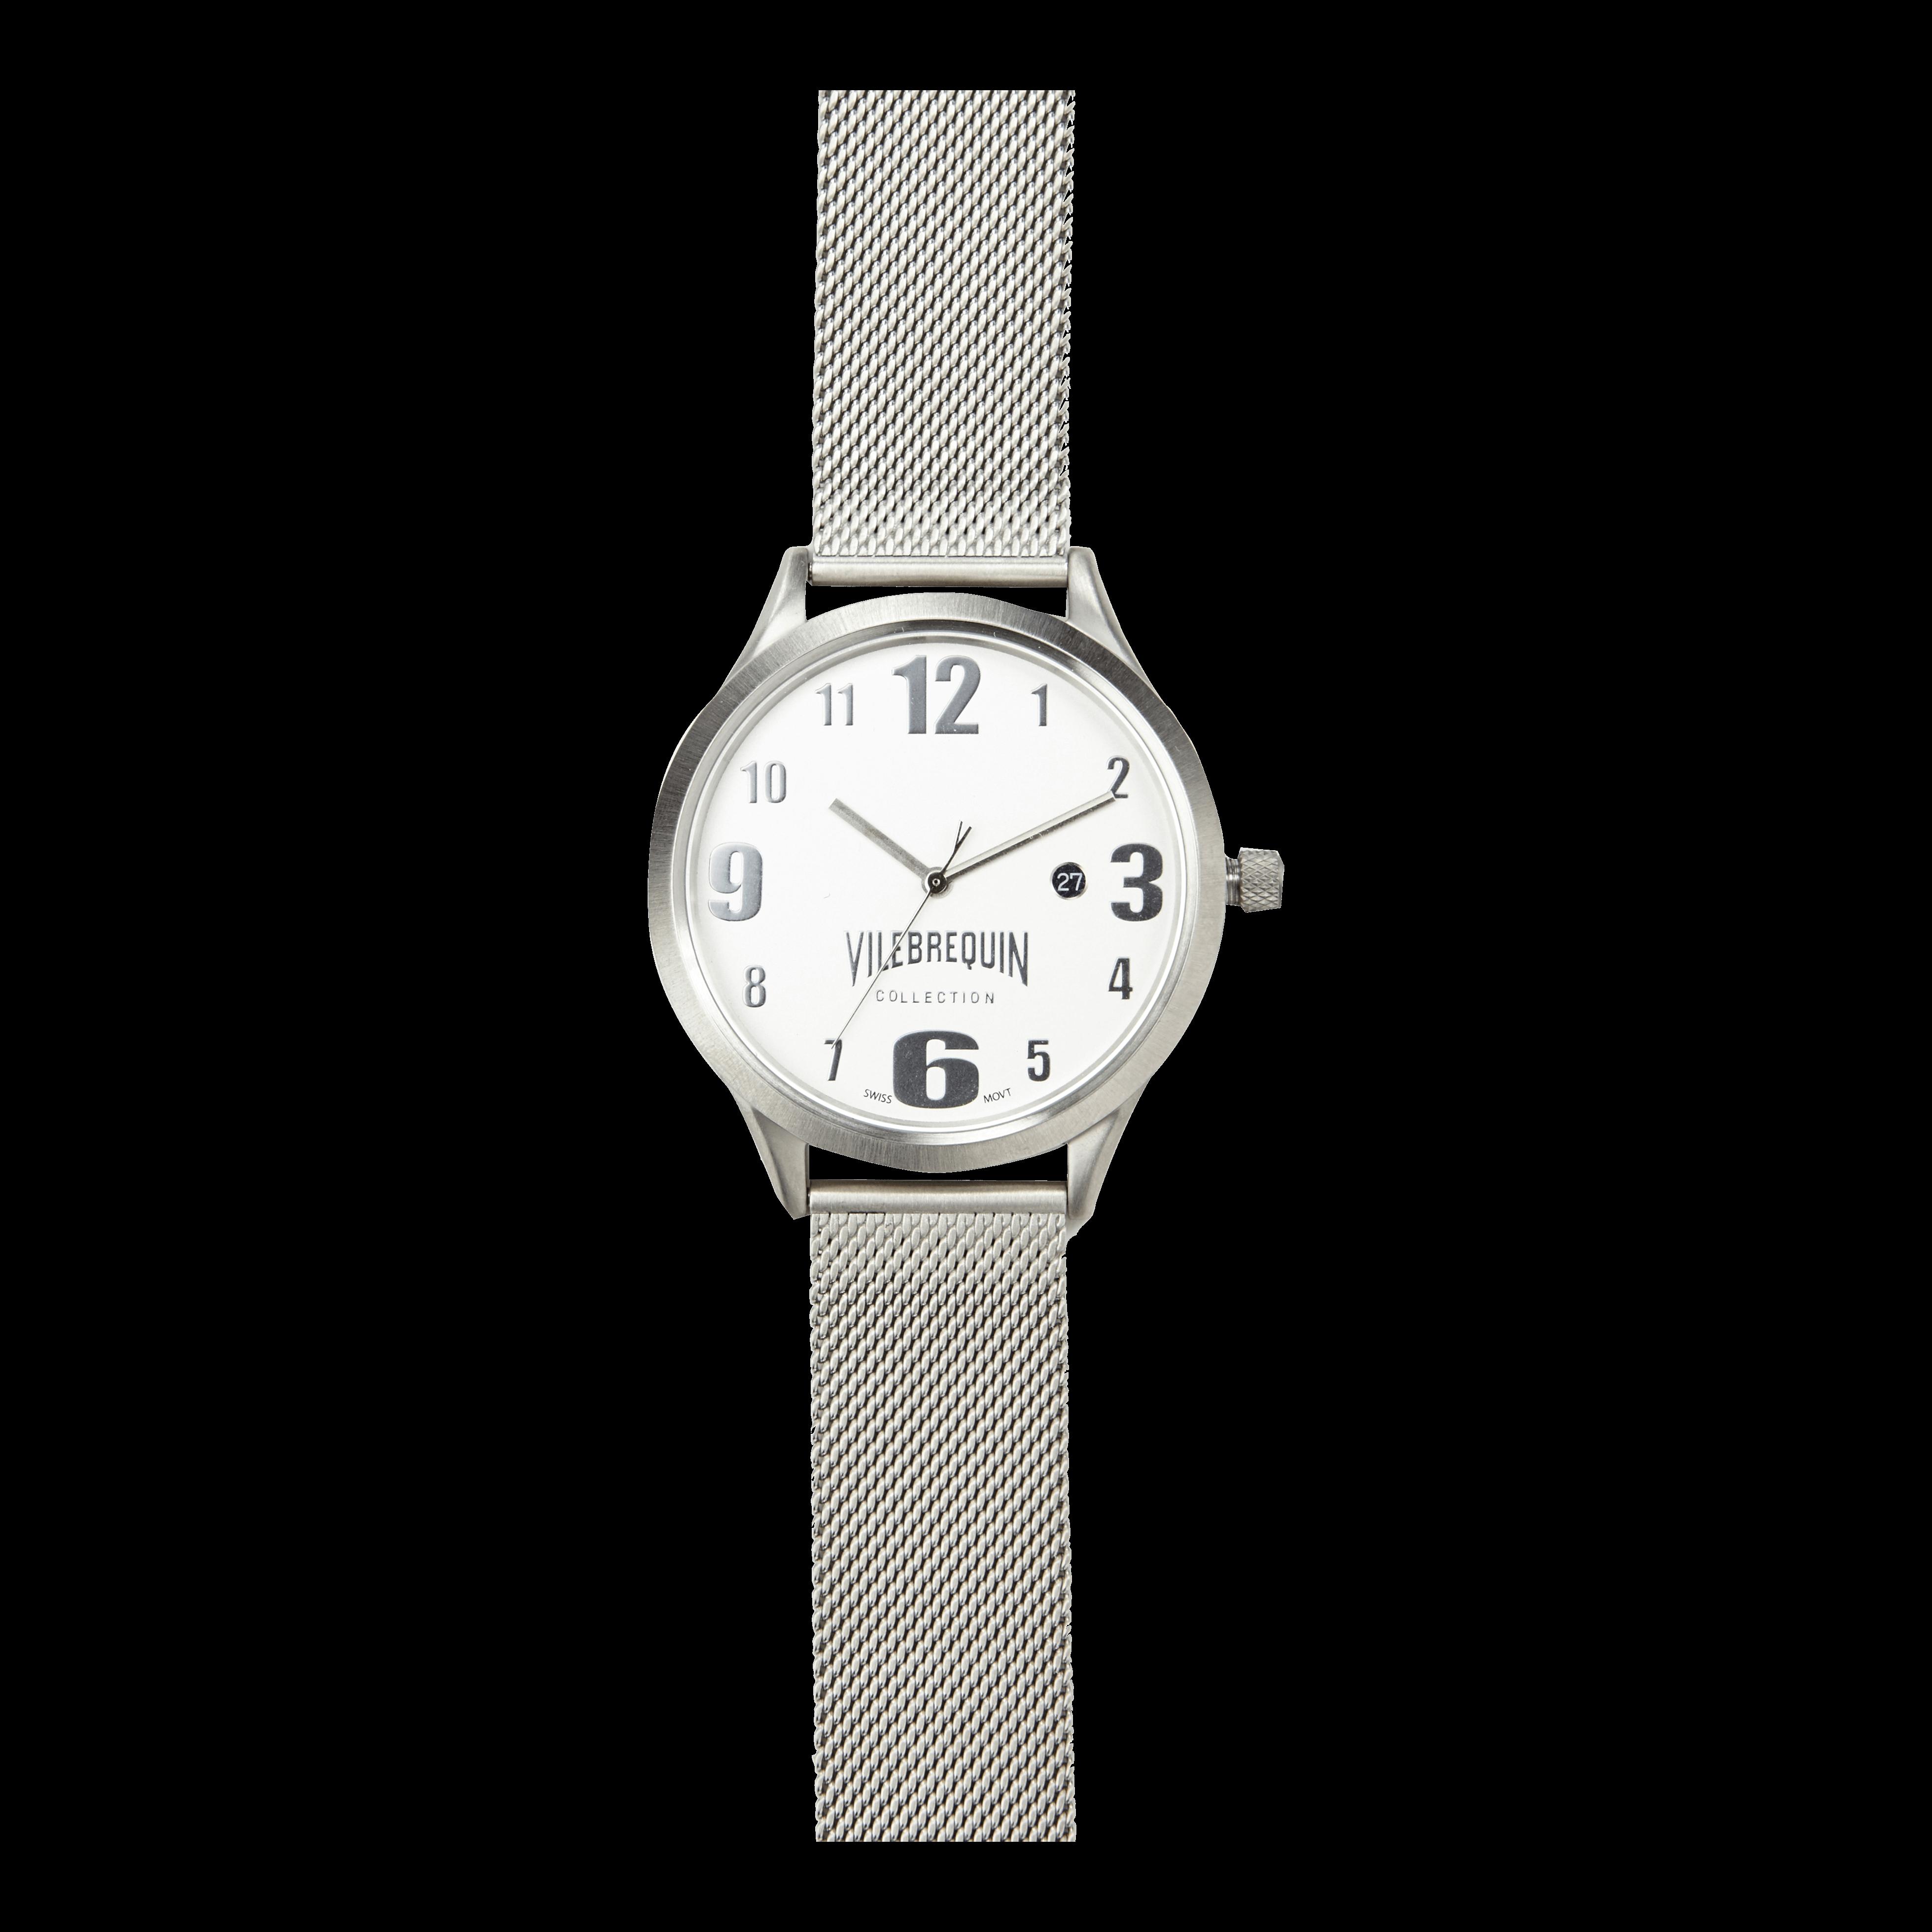 ACCESSOIRE UNISEXE ADULTE - Metal Mesh Silver Watch - MONTRE - METMESH - Gris - TU - Vilebrequin